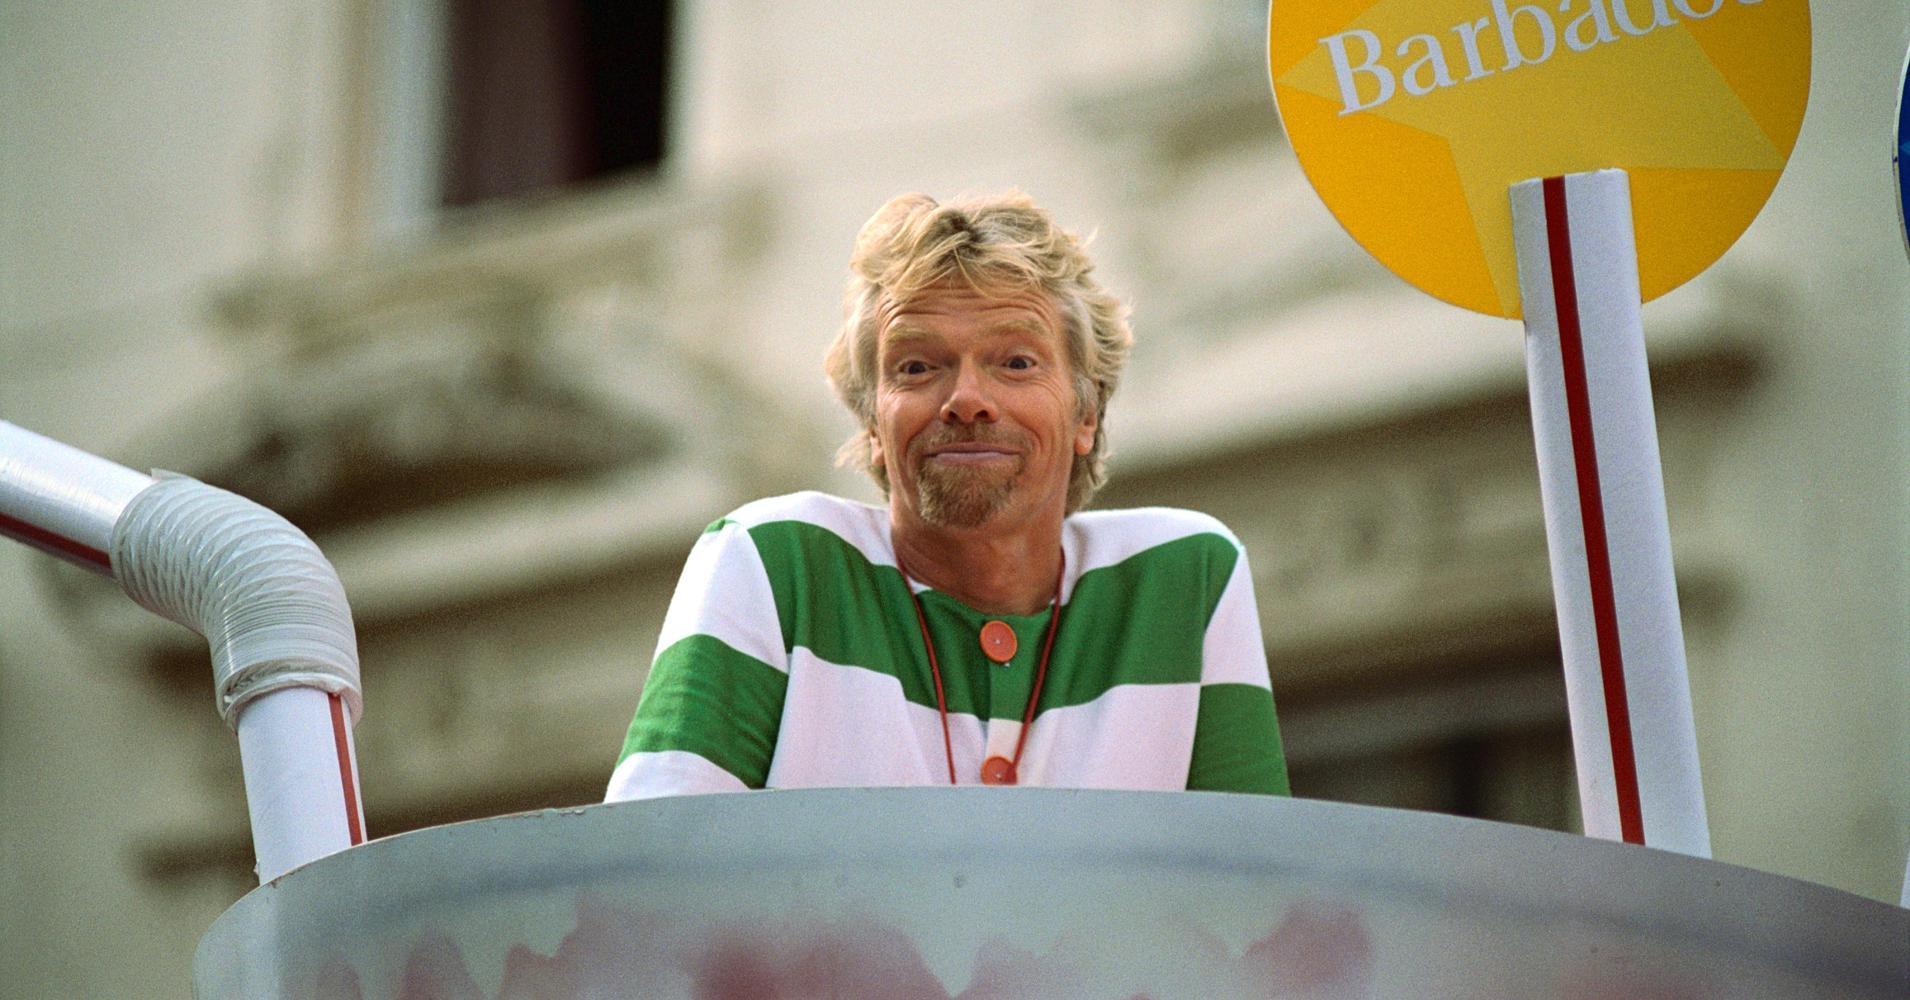 Richard Branson Drinks 20 Cups Of Tea A Day photo